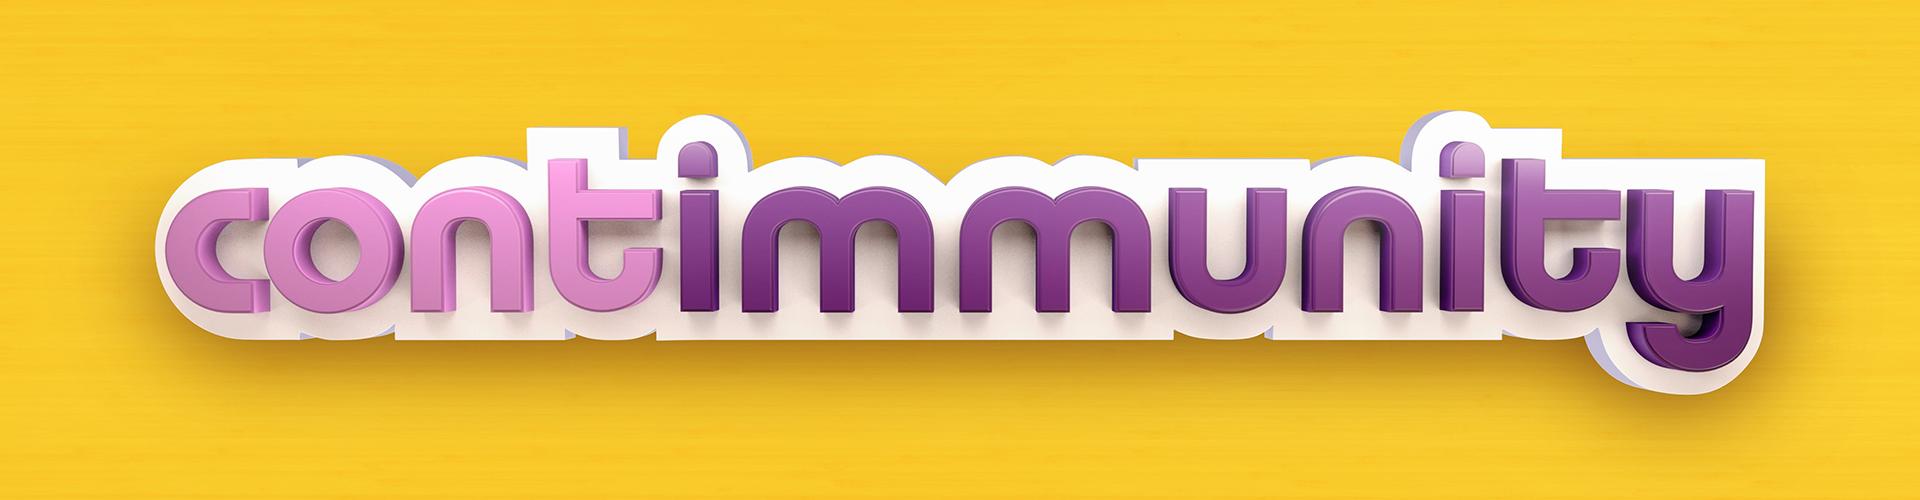 1920_0032_Logo.jpg